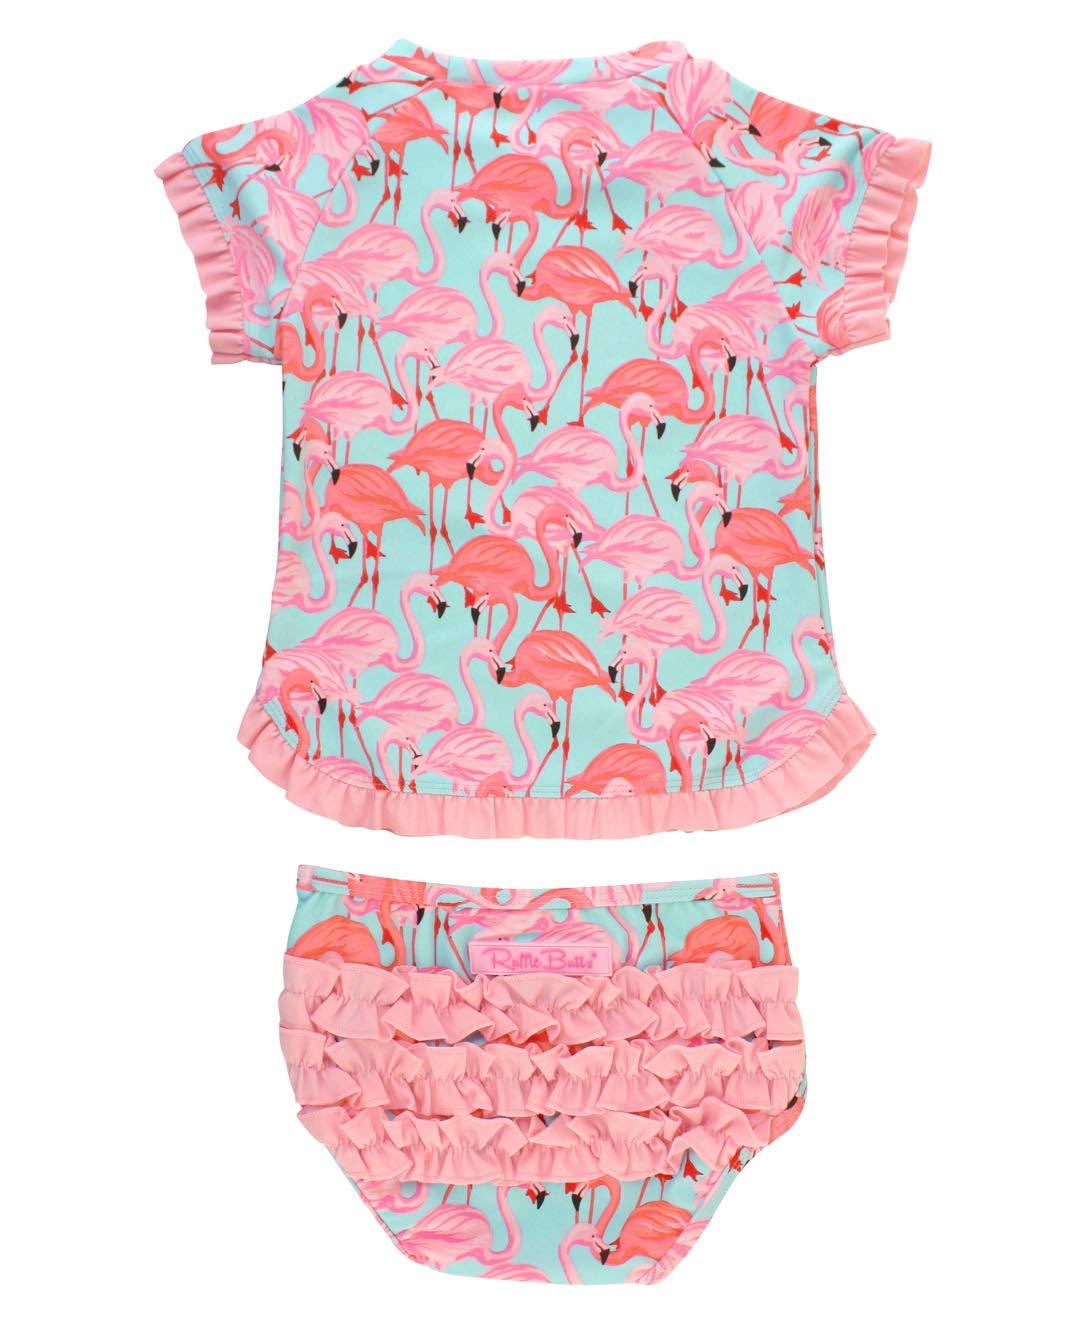 RuffleButts Baby/Toddler Girls Flamingo Swimsuit 2 Piece Short Sleeve UPF 50+ Rash Guard Set - 12-18m by RuffleButts